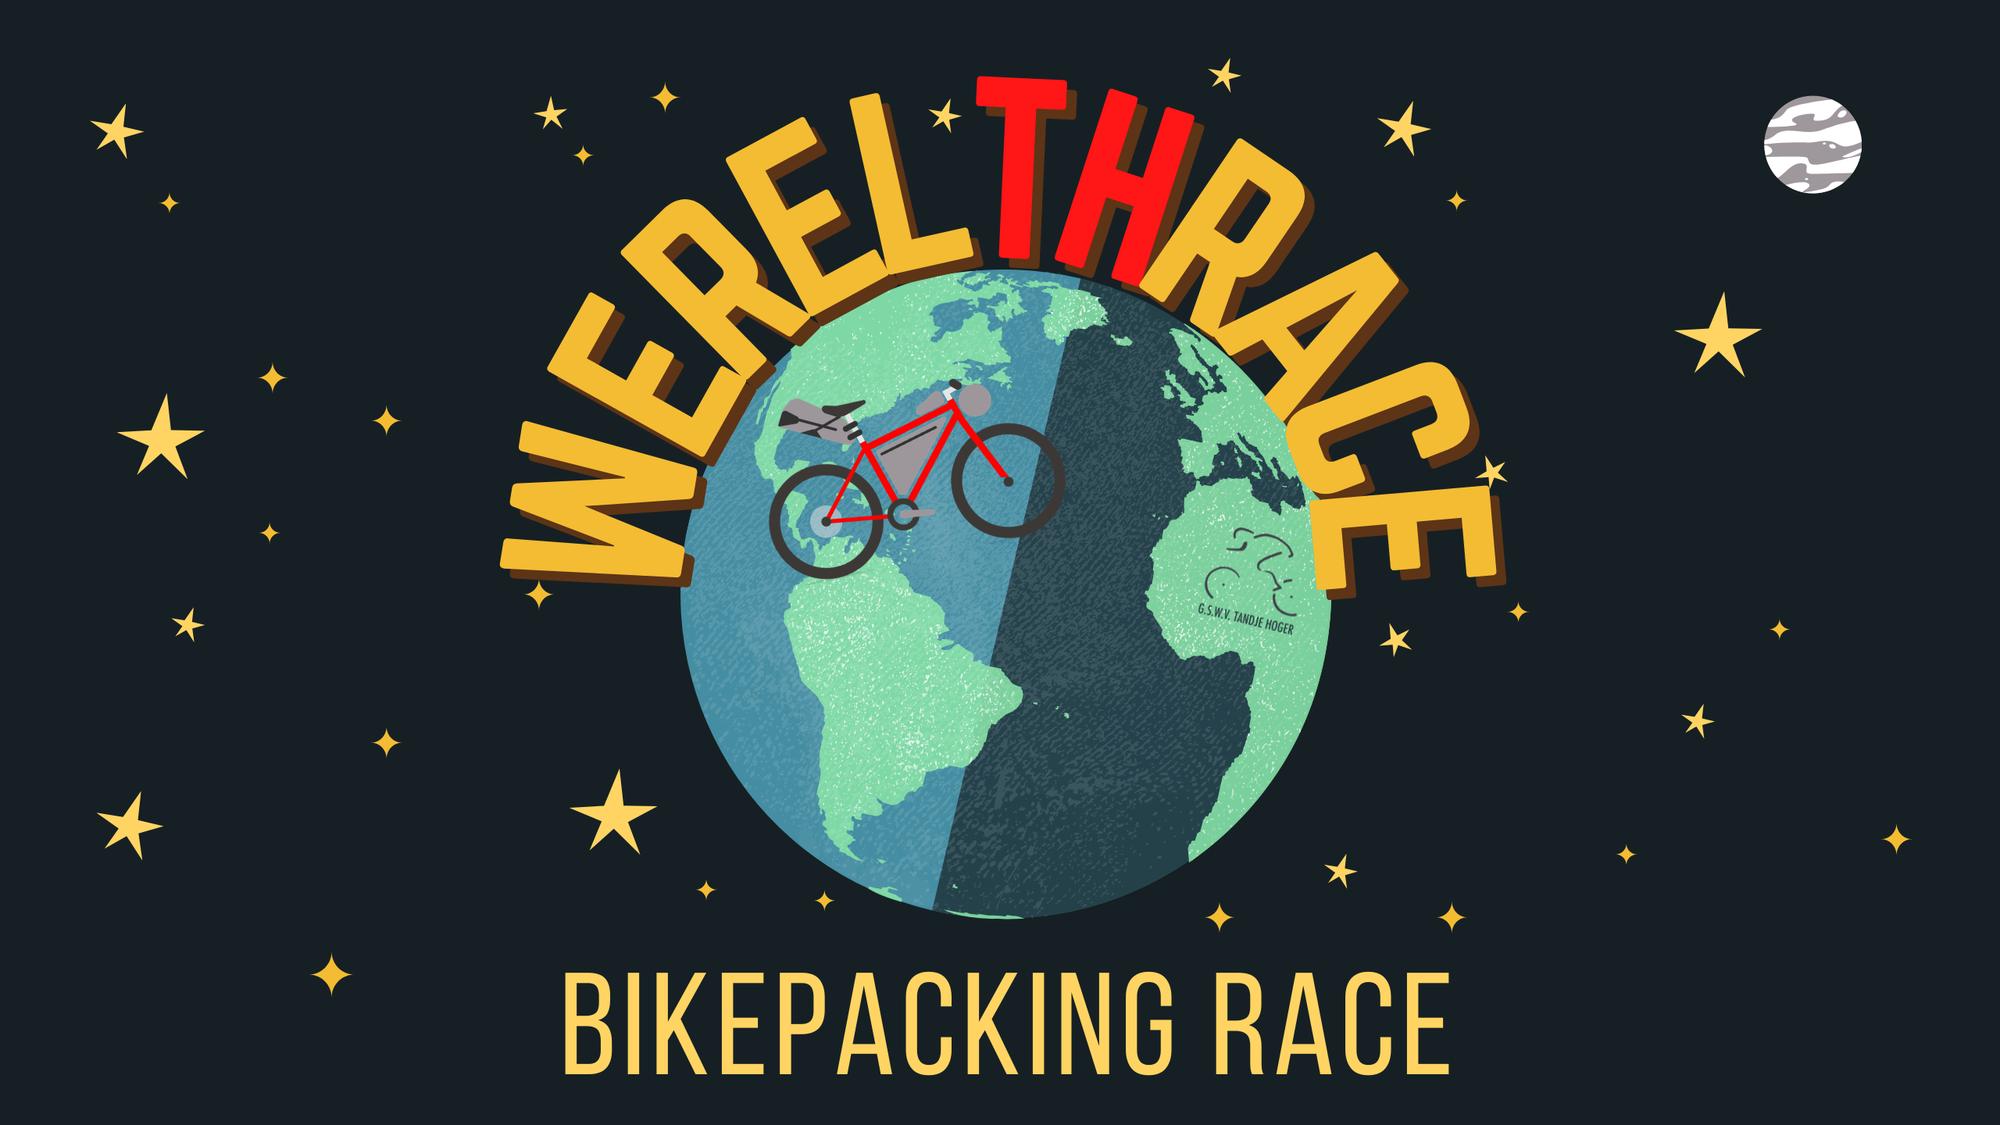 WerelTHrace